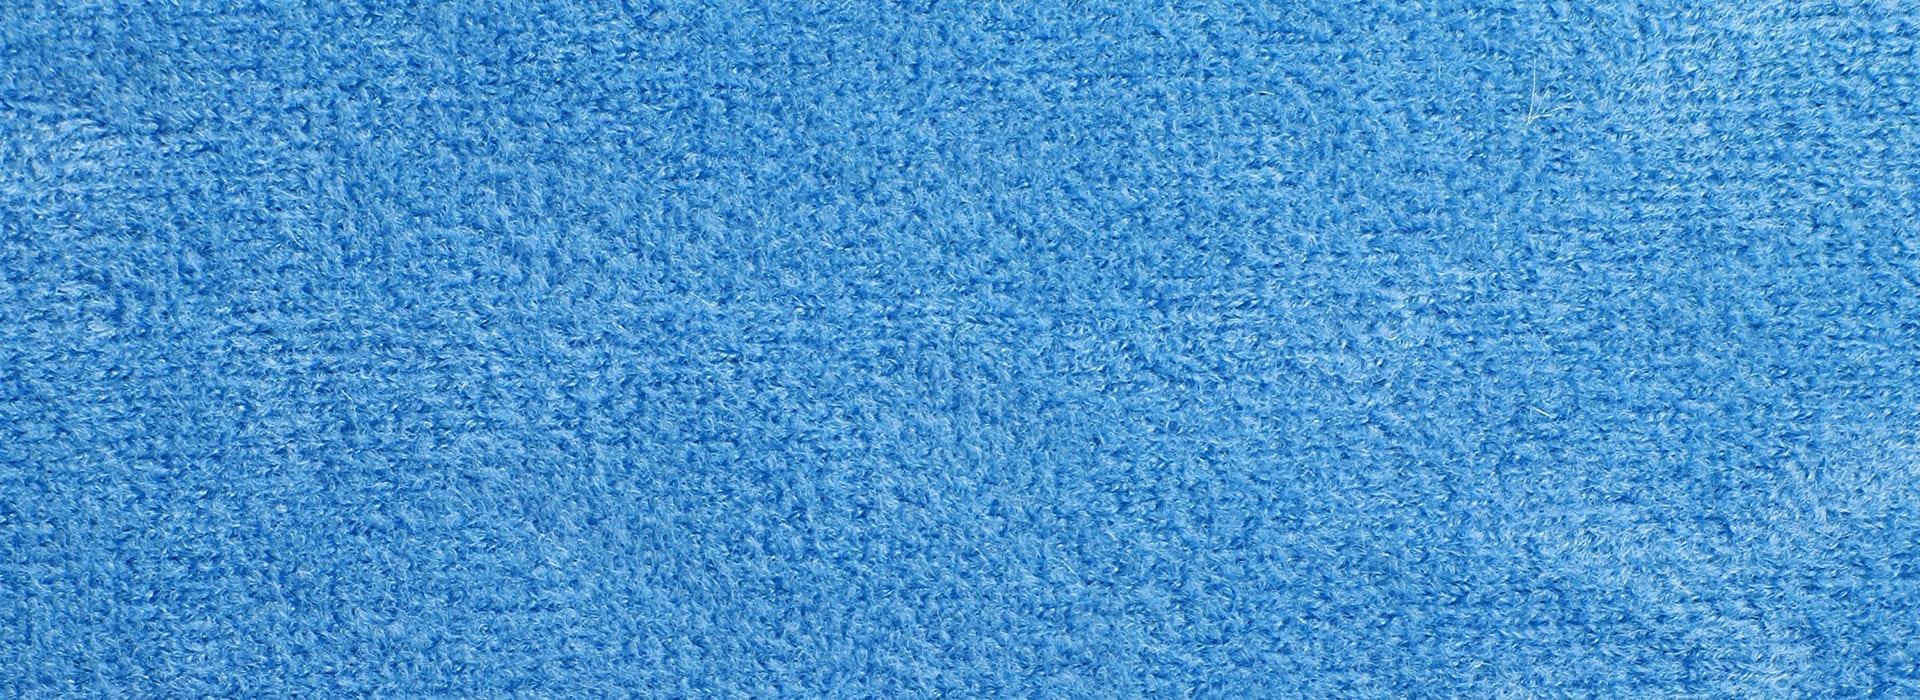 blue-carpet-flooring